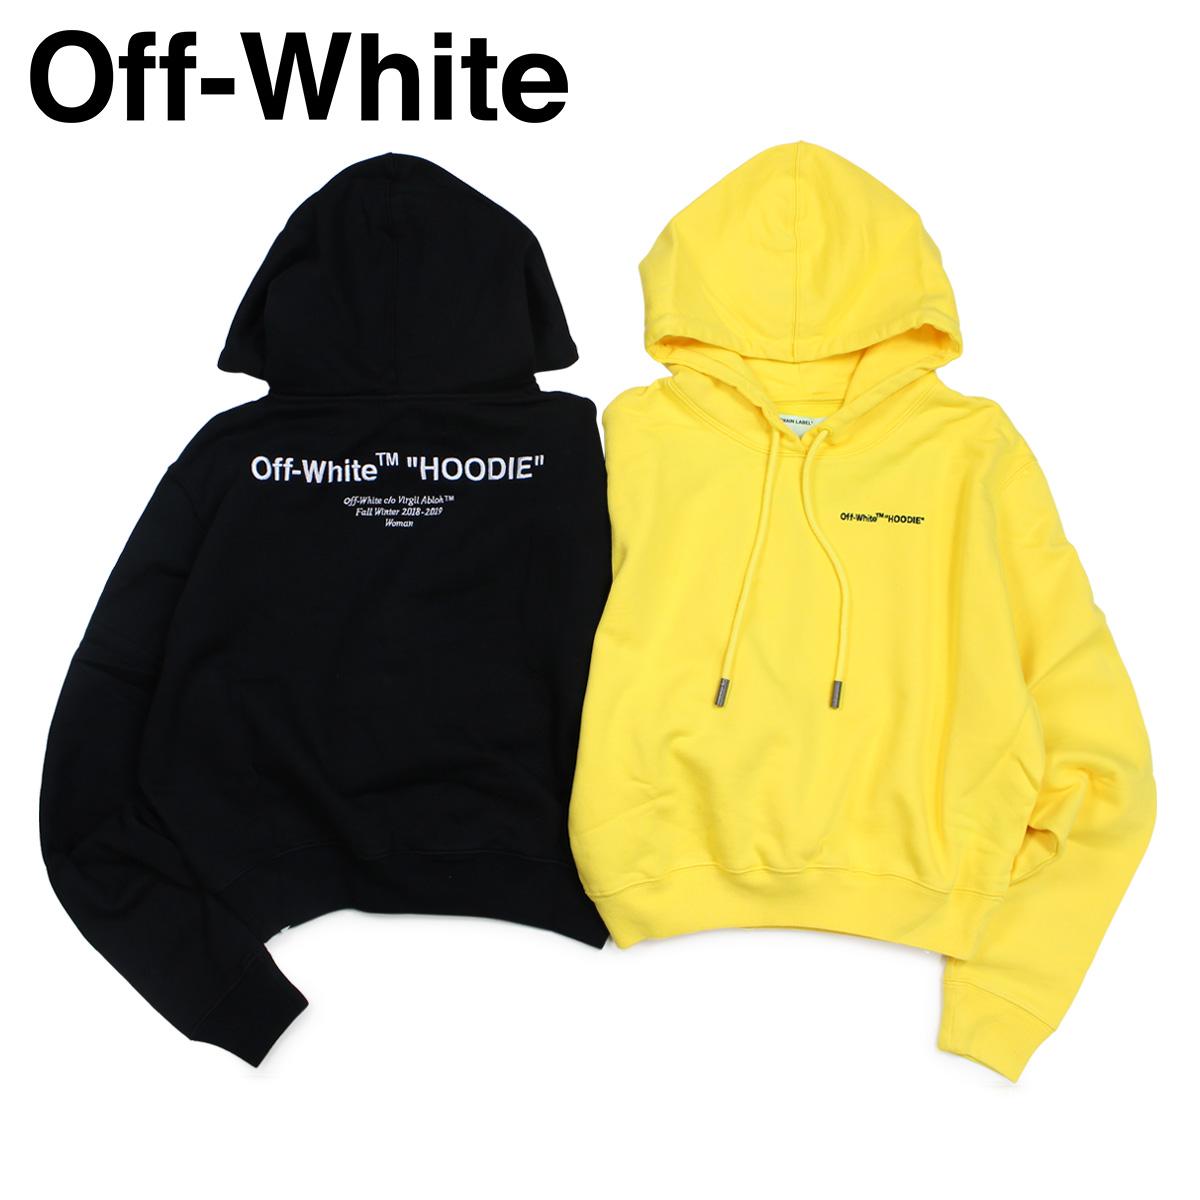 b8b5fb5598a4 Sugar Online Shop  Off-white Off-white parka pullover Lady s sweat shirt  FELPA STAMPA LOGO SWEATSHIRT black yellow OWBB016 003036  11 19 Shinnyu  load  ...